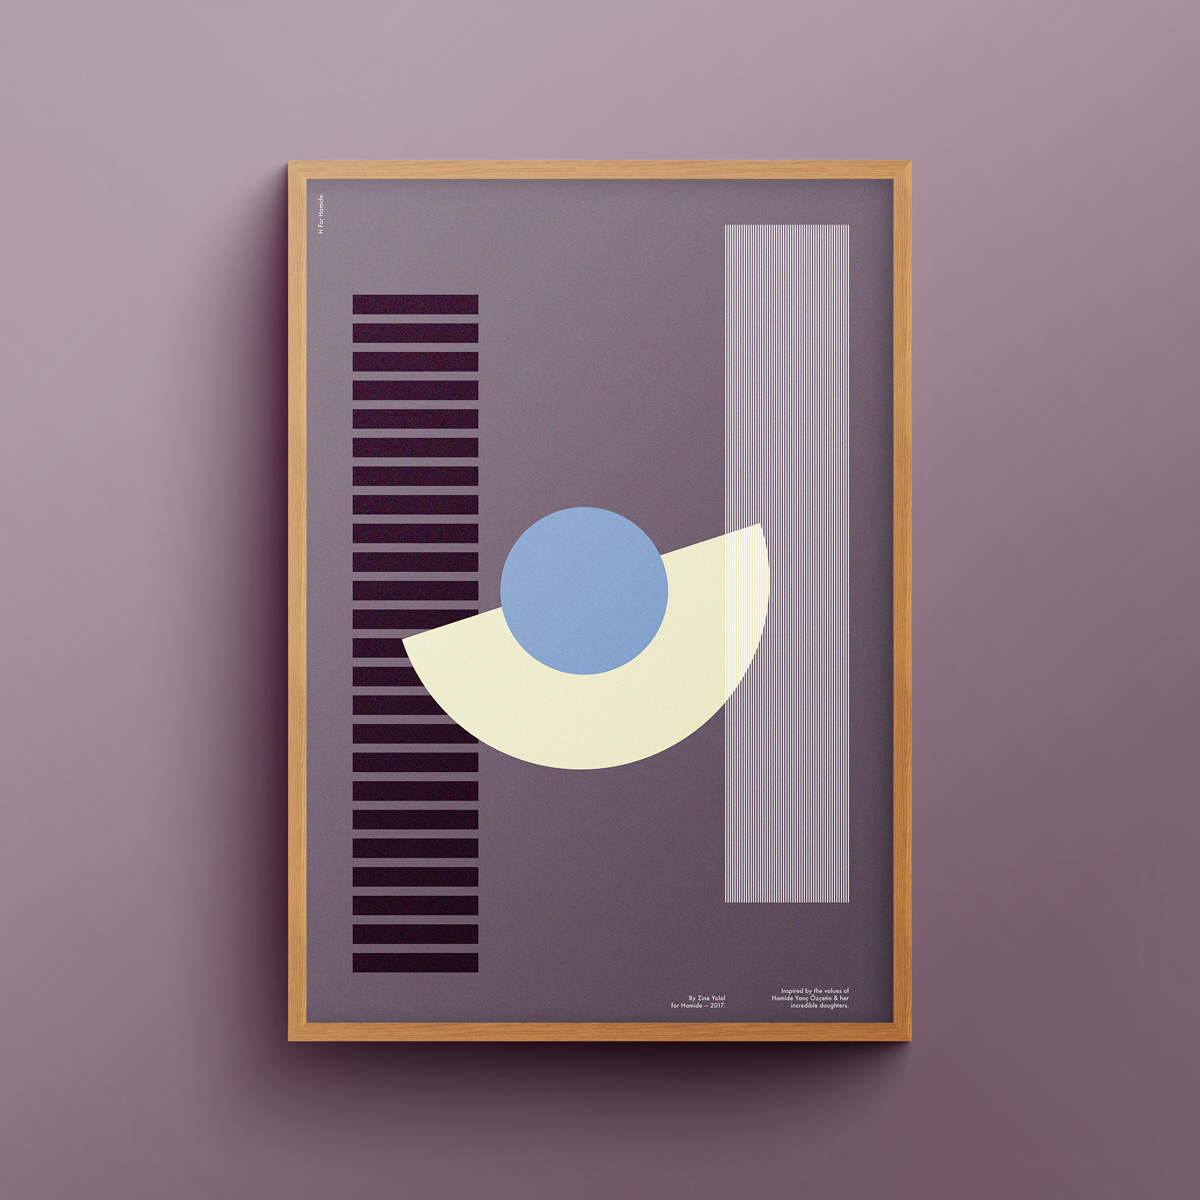 """H for Hamide: Constructive"" art print in wooden frame"